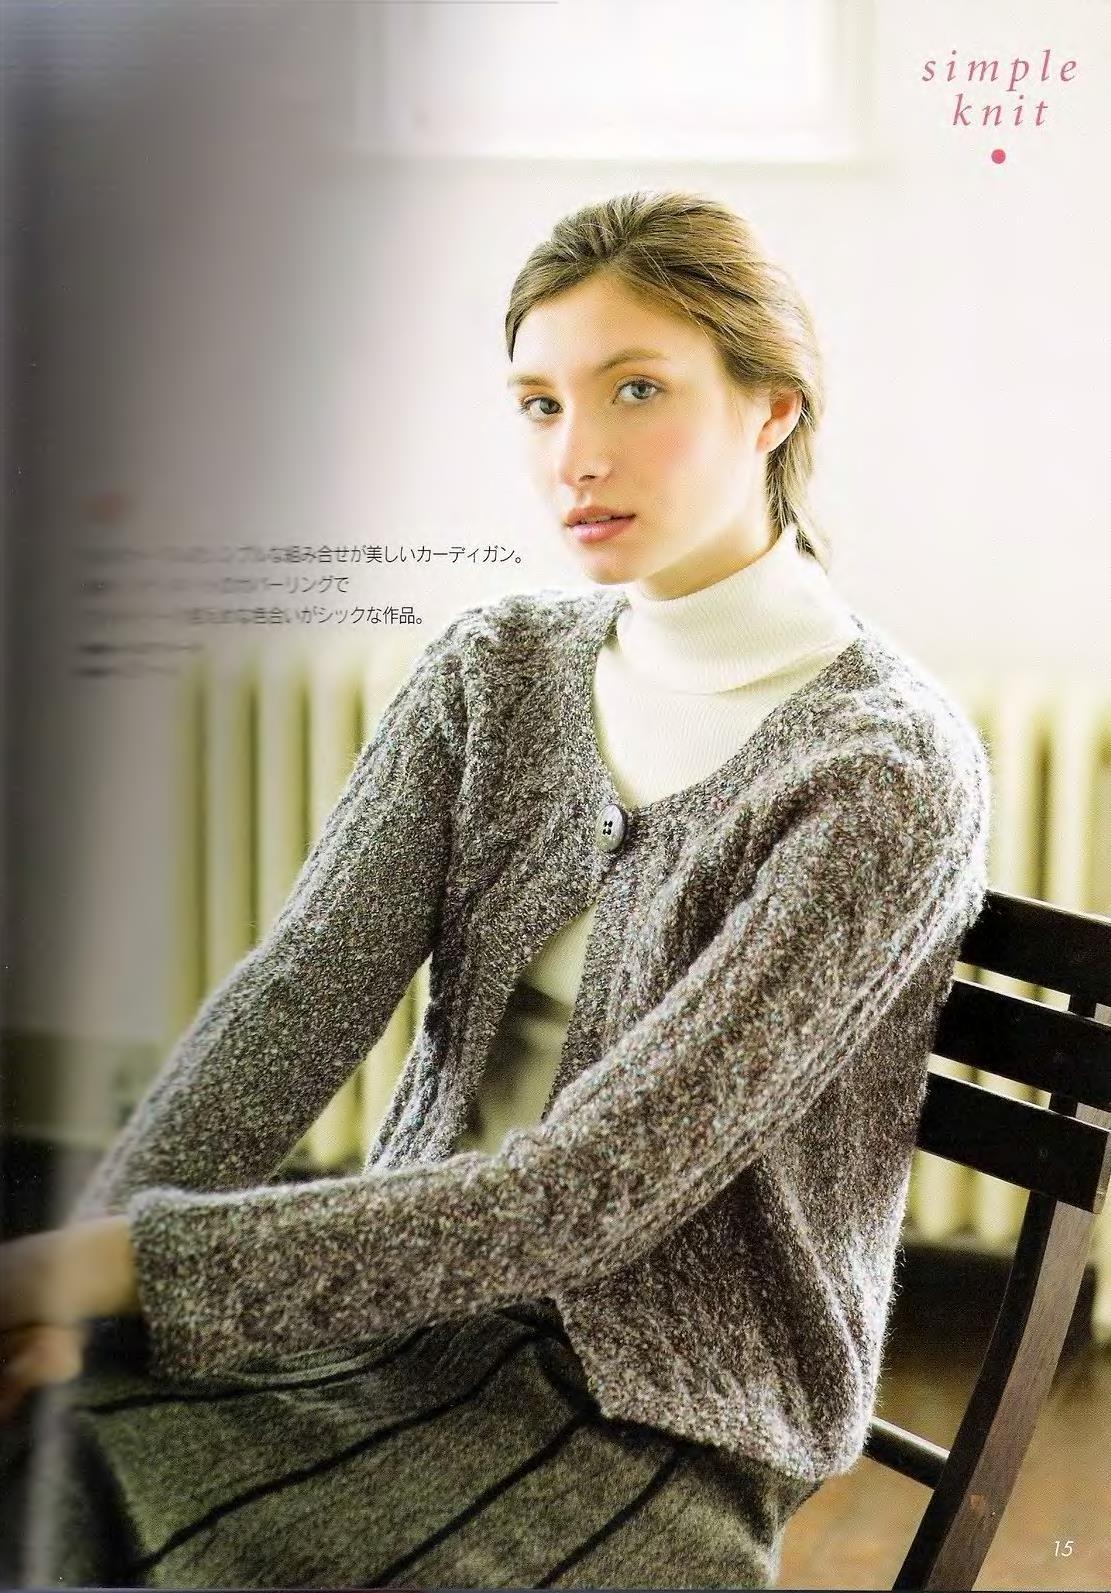 Let's knit series NV4375 2008 M-L sp-kr_15